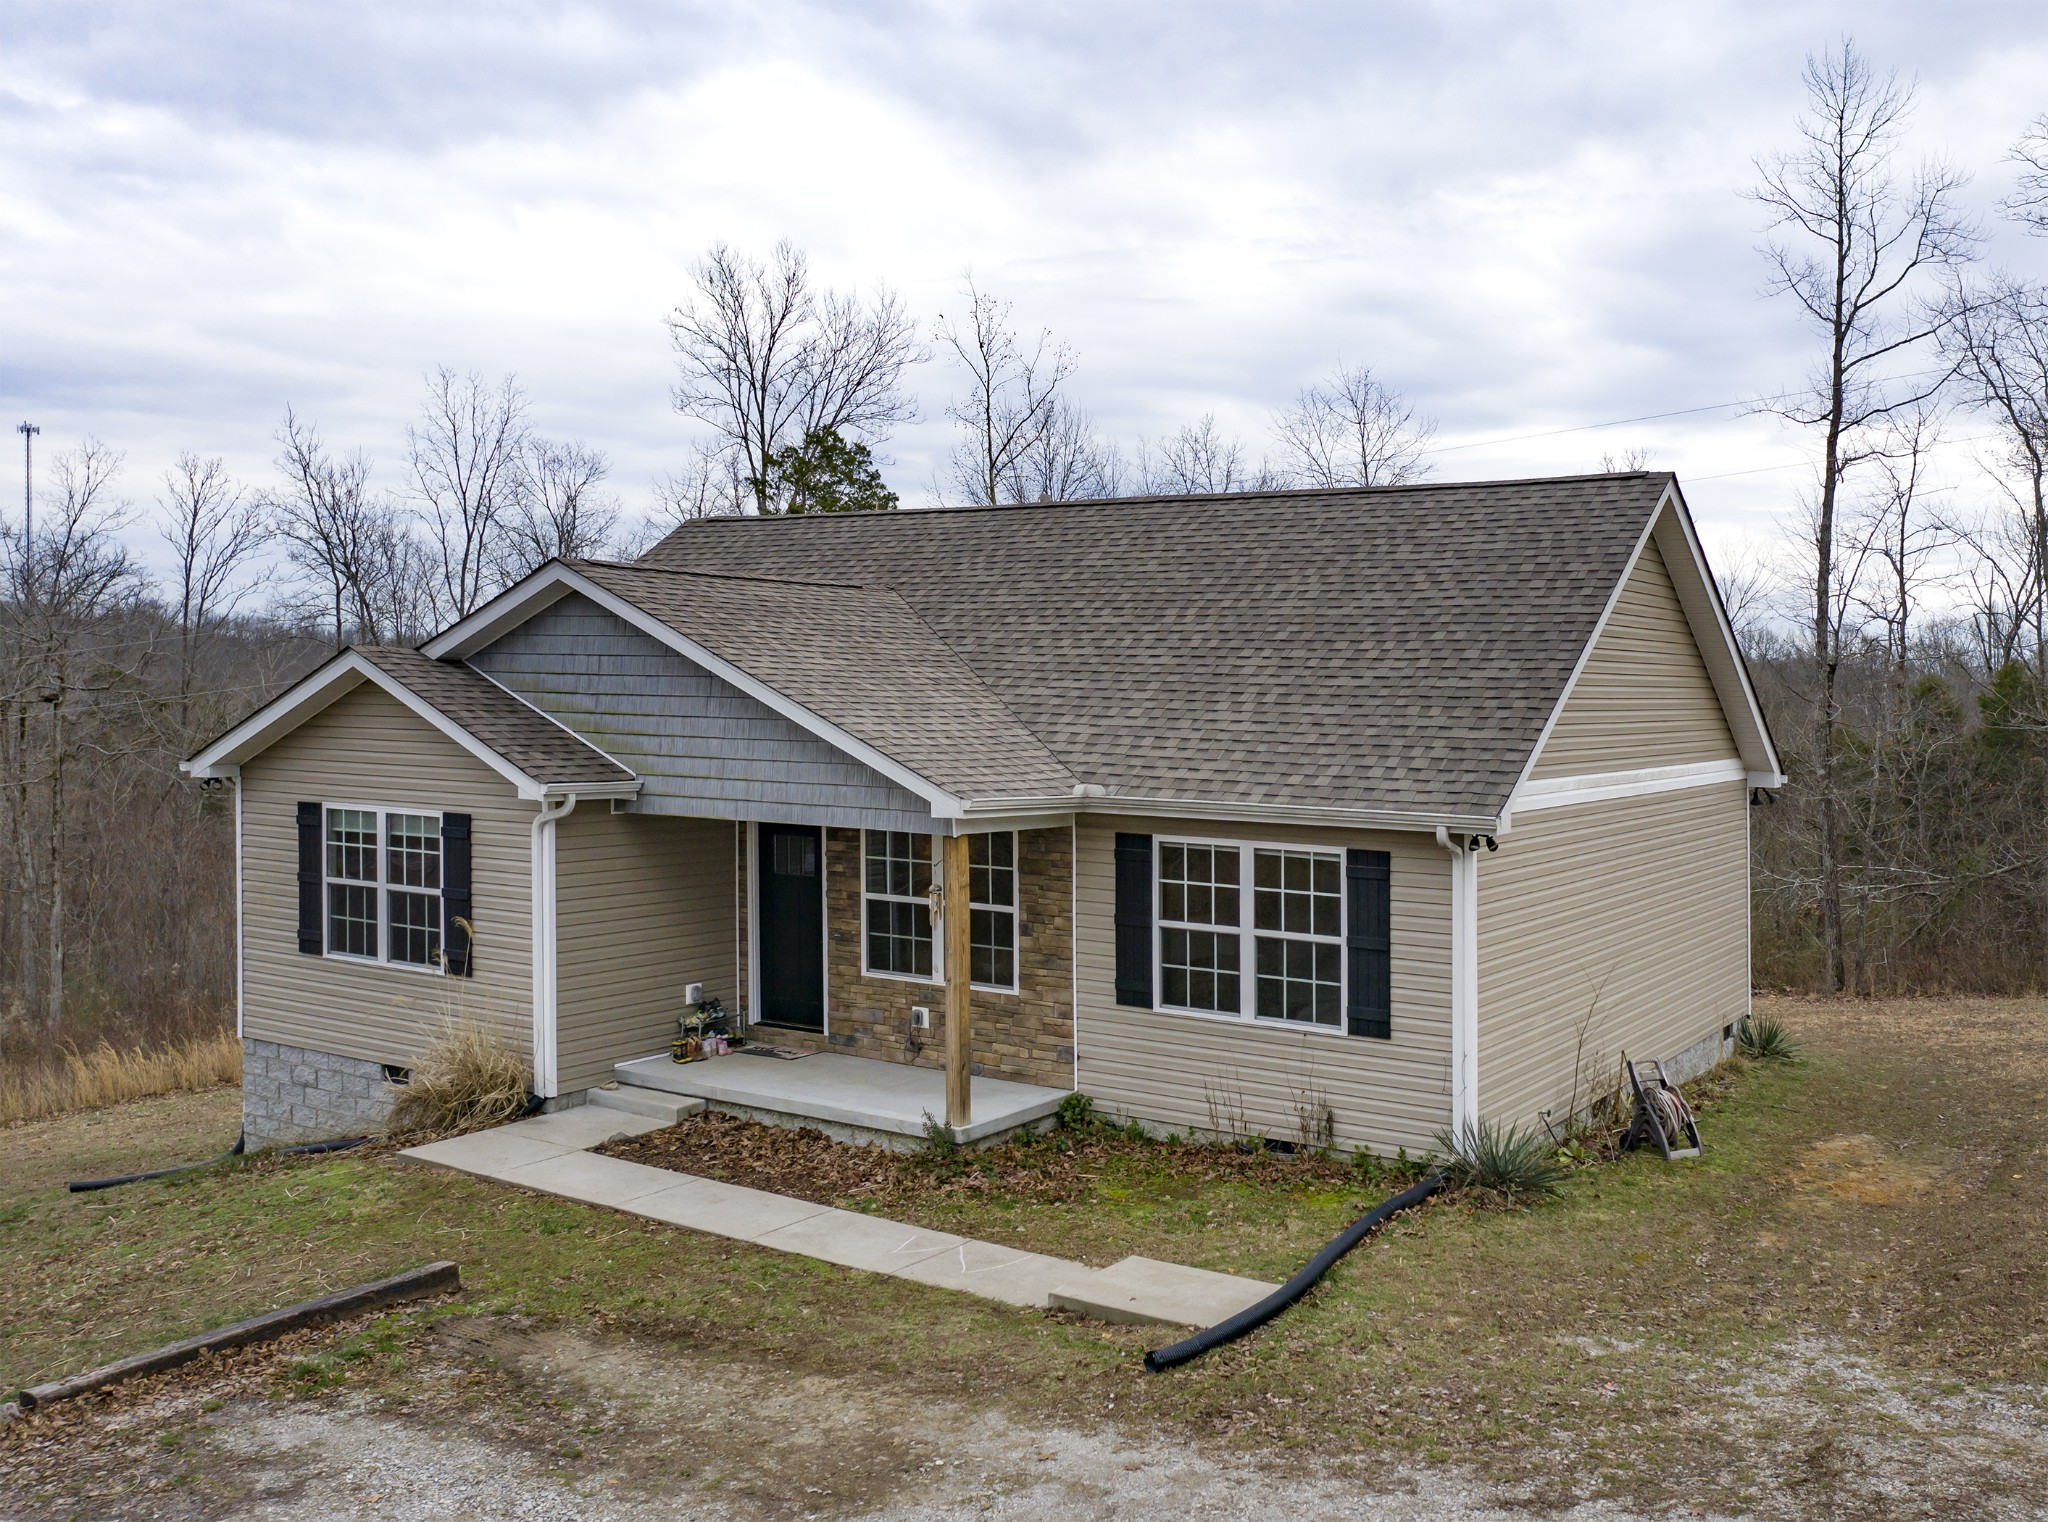 872 Hooper Rd, Charlotte, TN 37036 - Charlotte, TN real estate listing